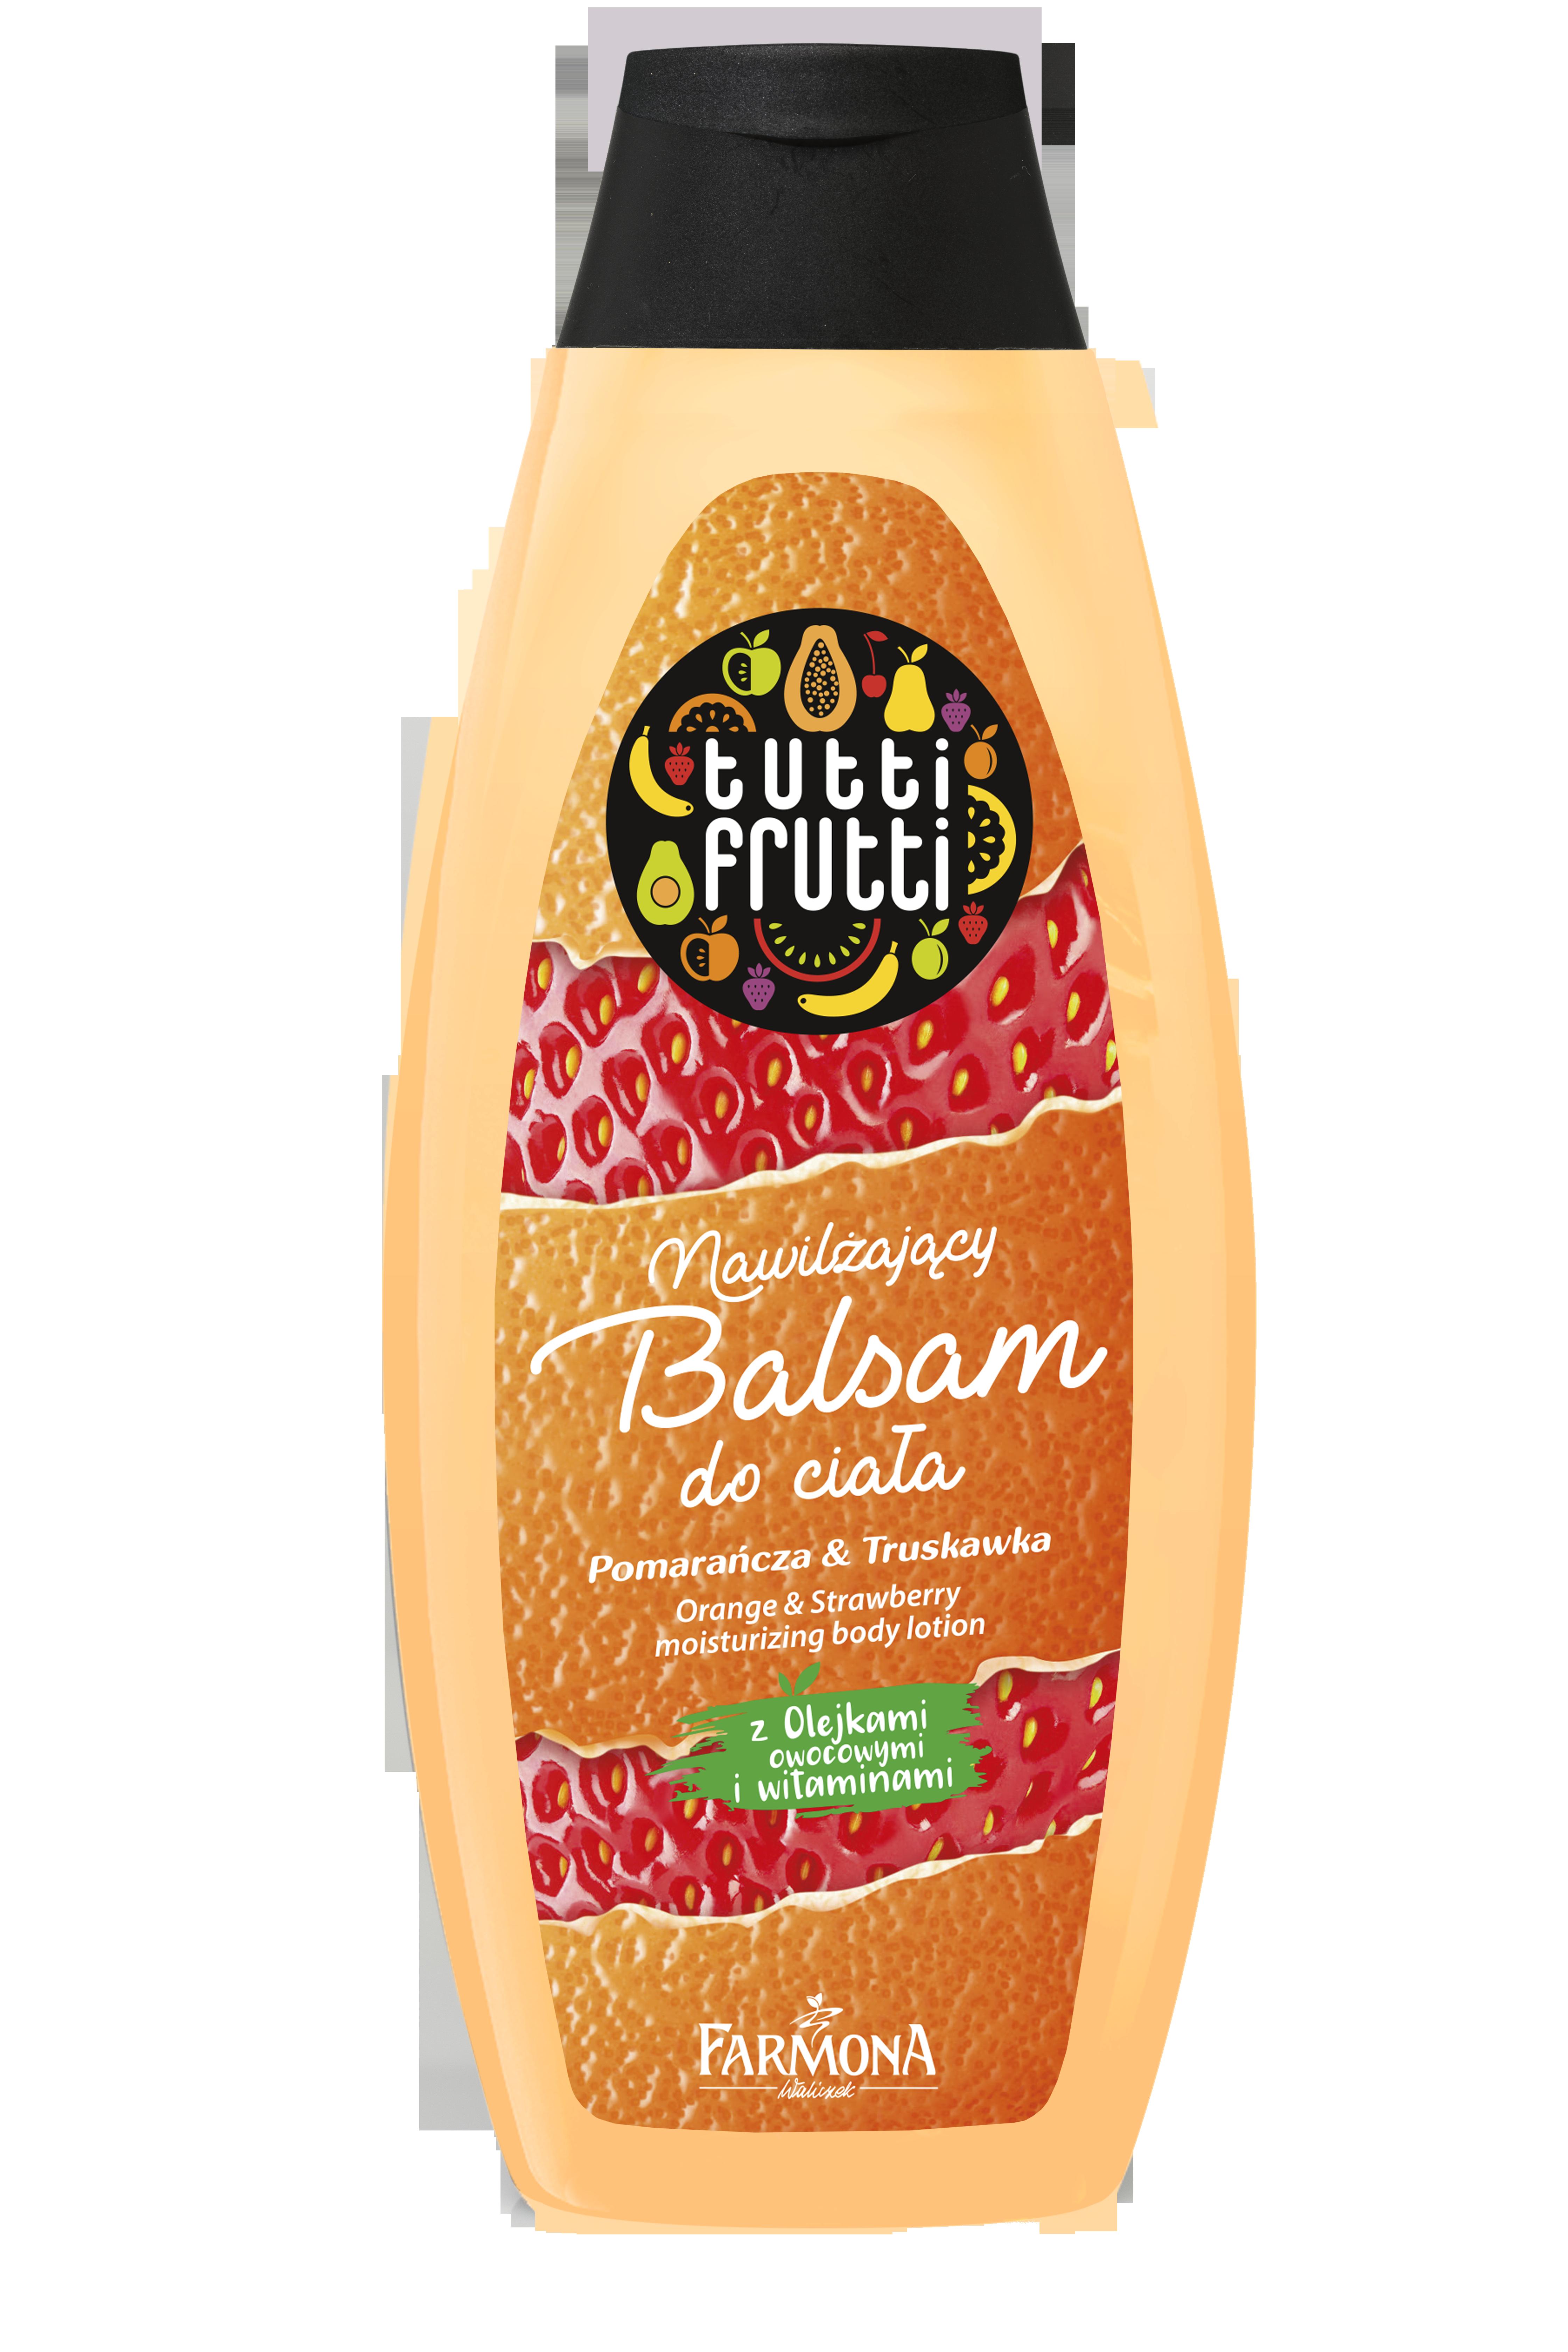 Tutti_Frutti_Balsamy_TRUSKAWKA